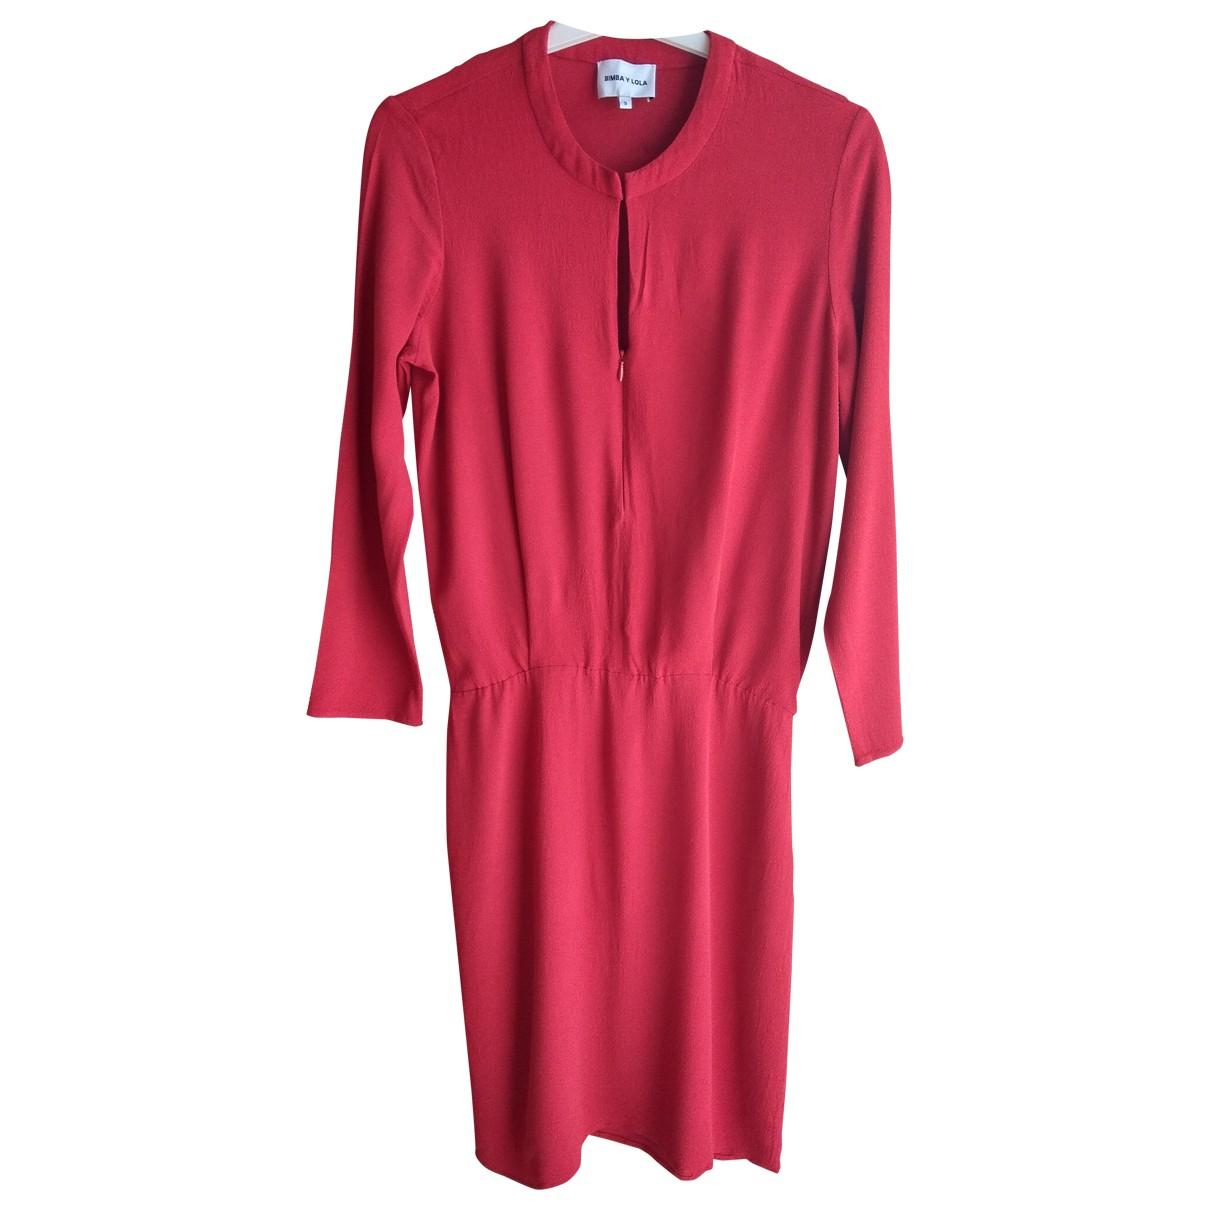 Bimba Y Lola \N Red dress for Women S International